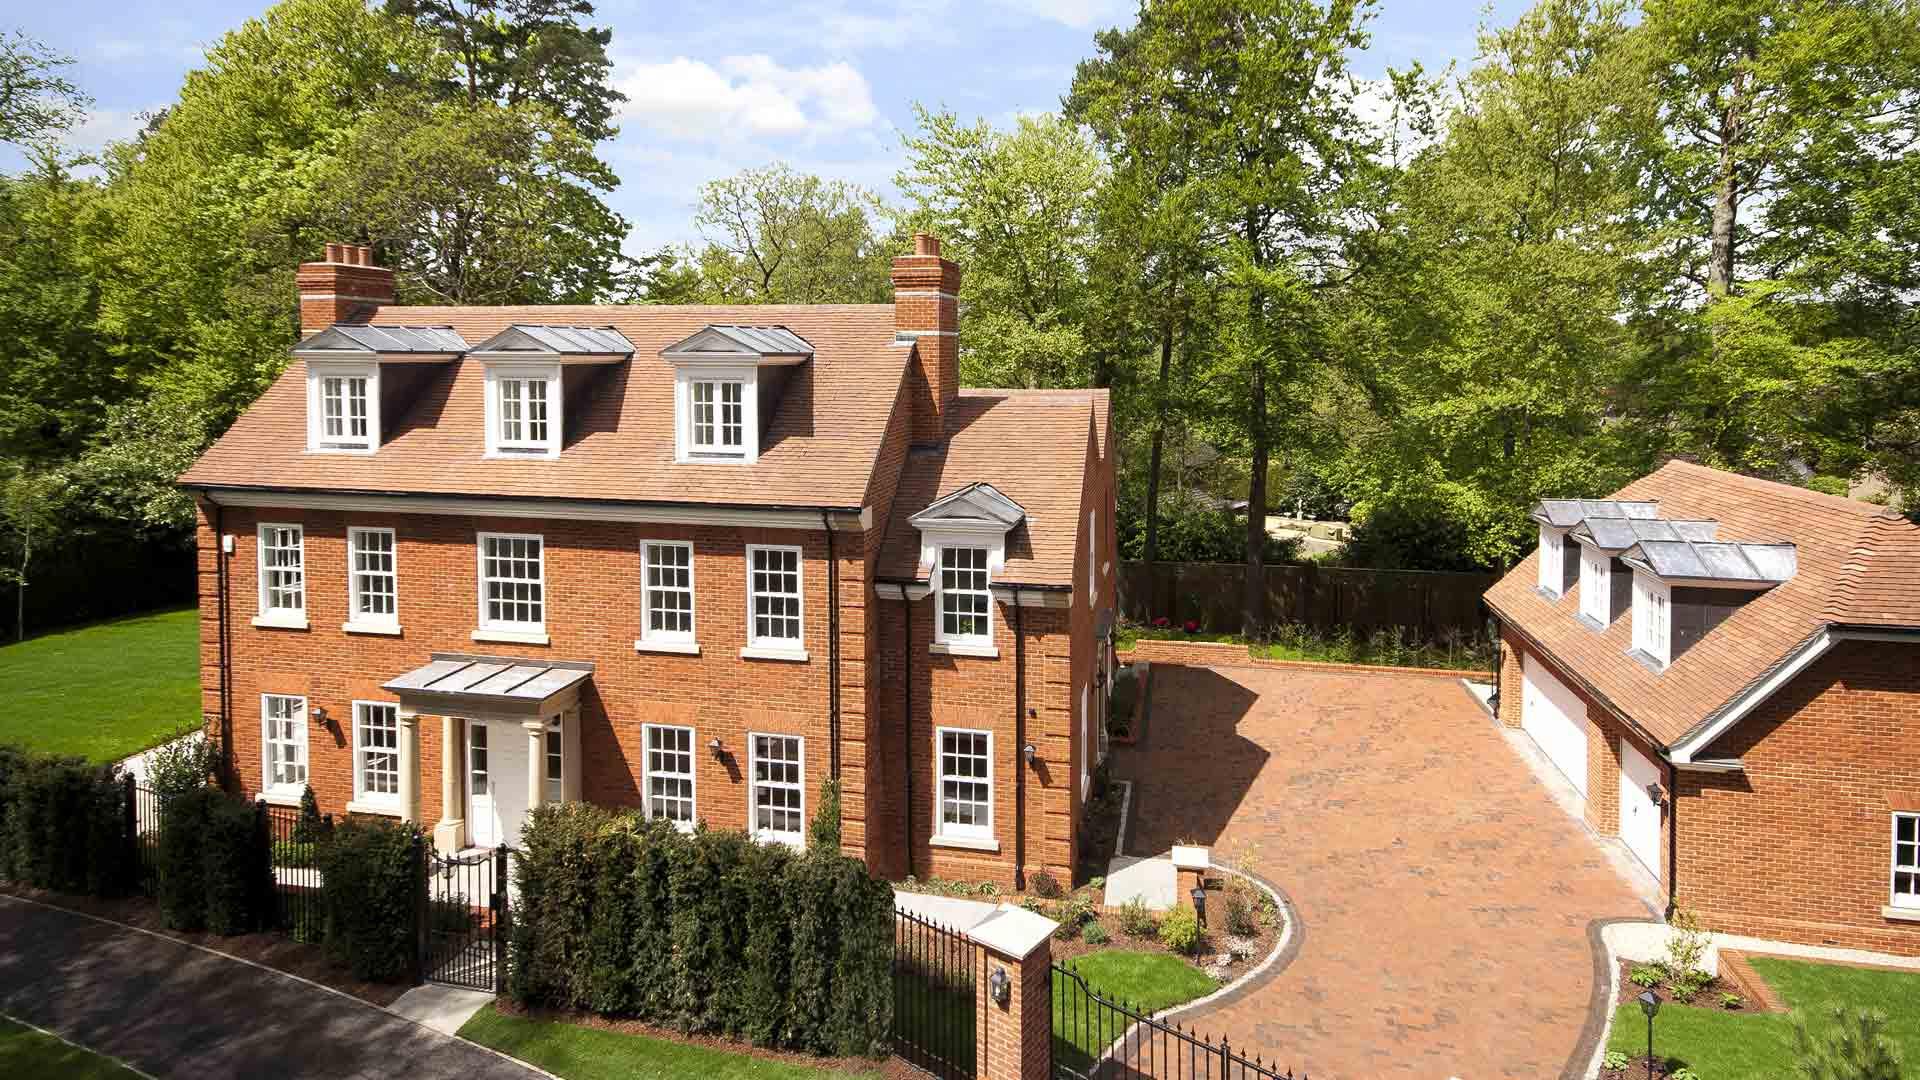 Hanover house nationcrest plc for The hanover house